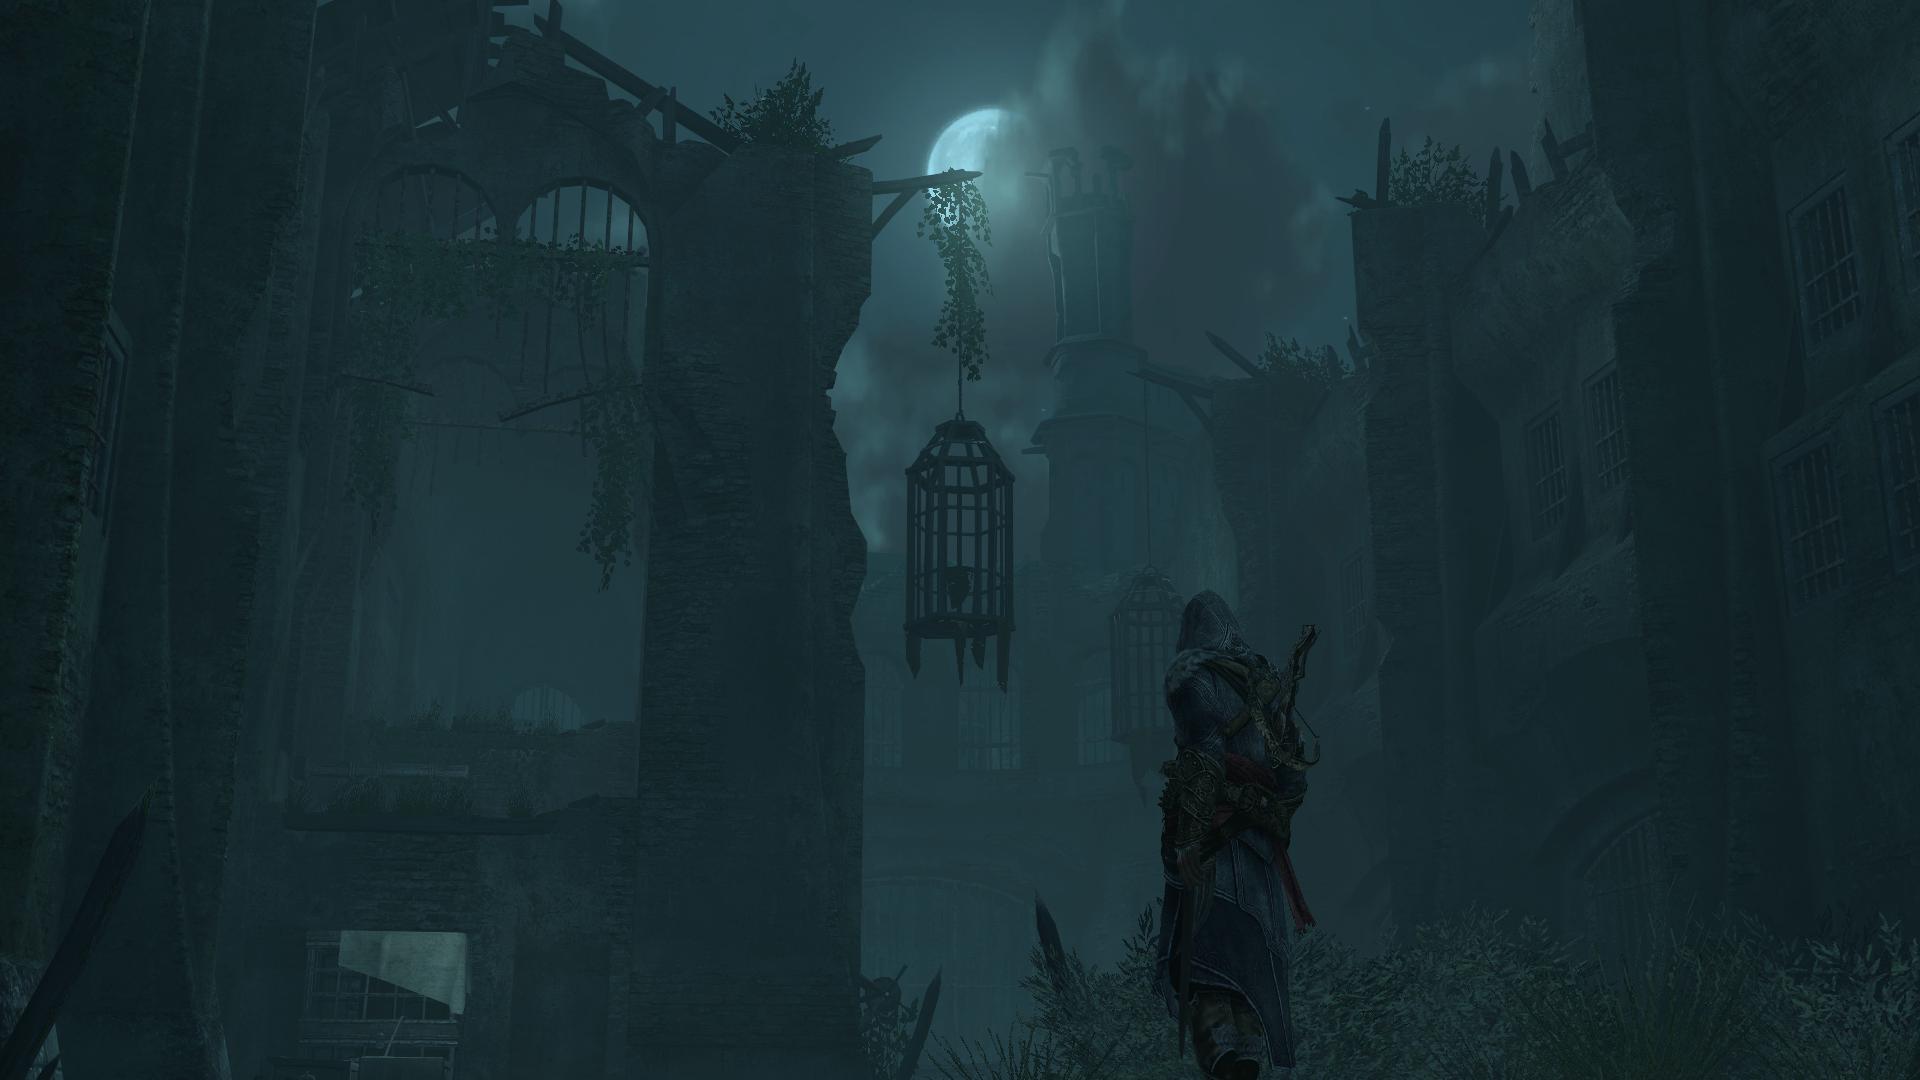 Vlad the Impaler's Prison